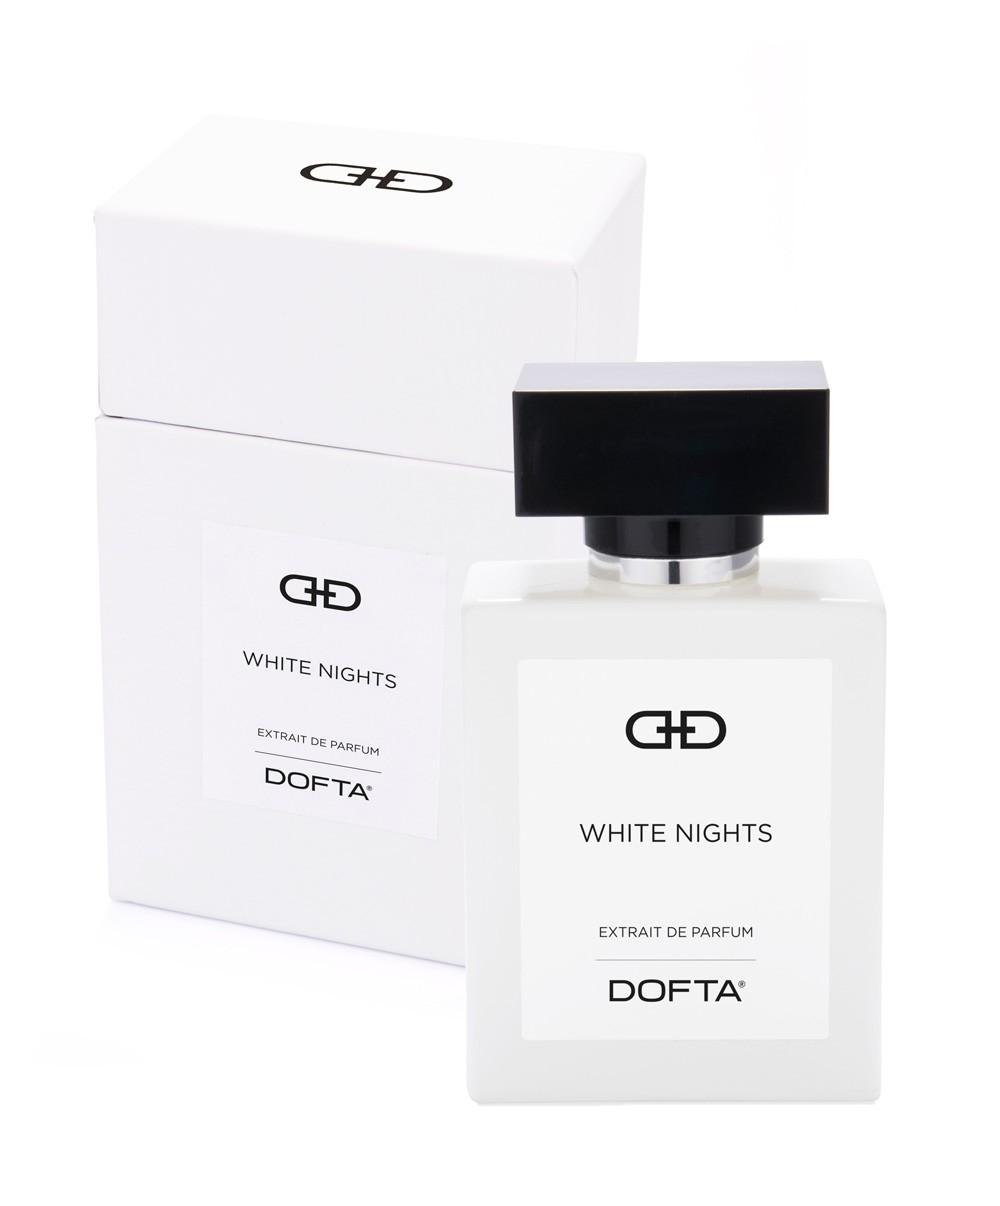 Dofta White Nights Extrait De Parfum аромат для мужчин и женщин